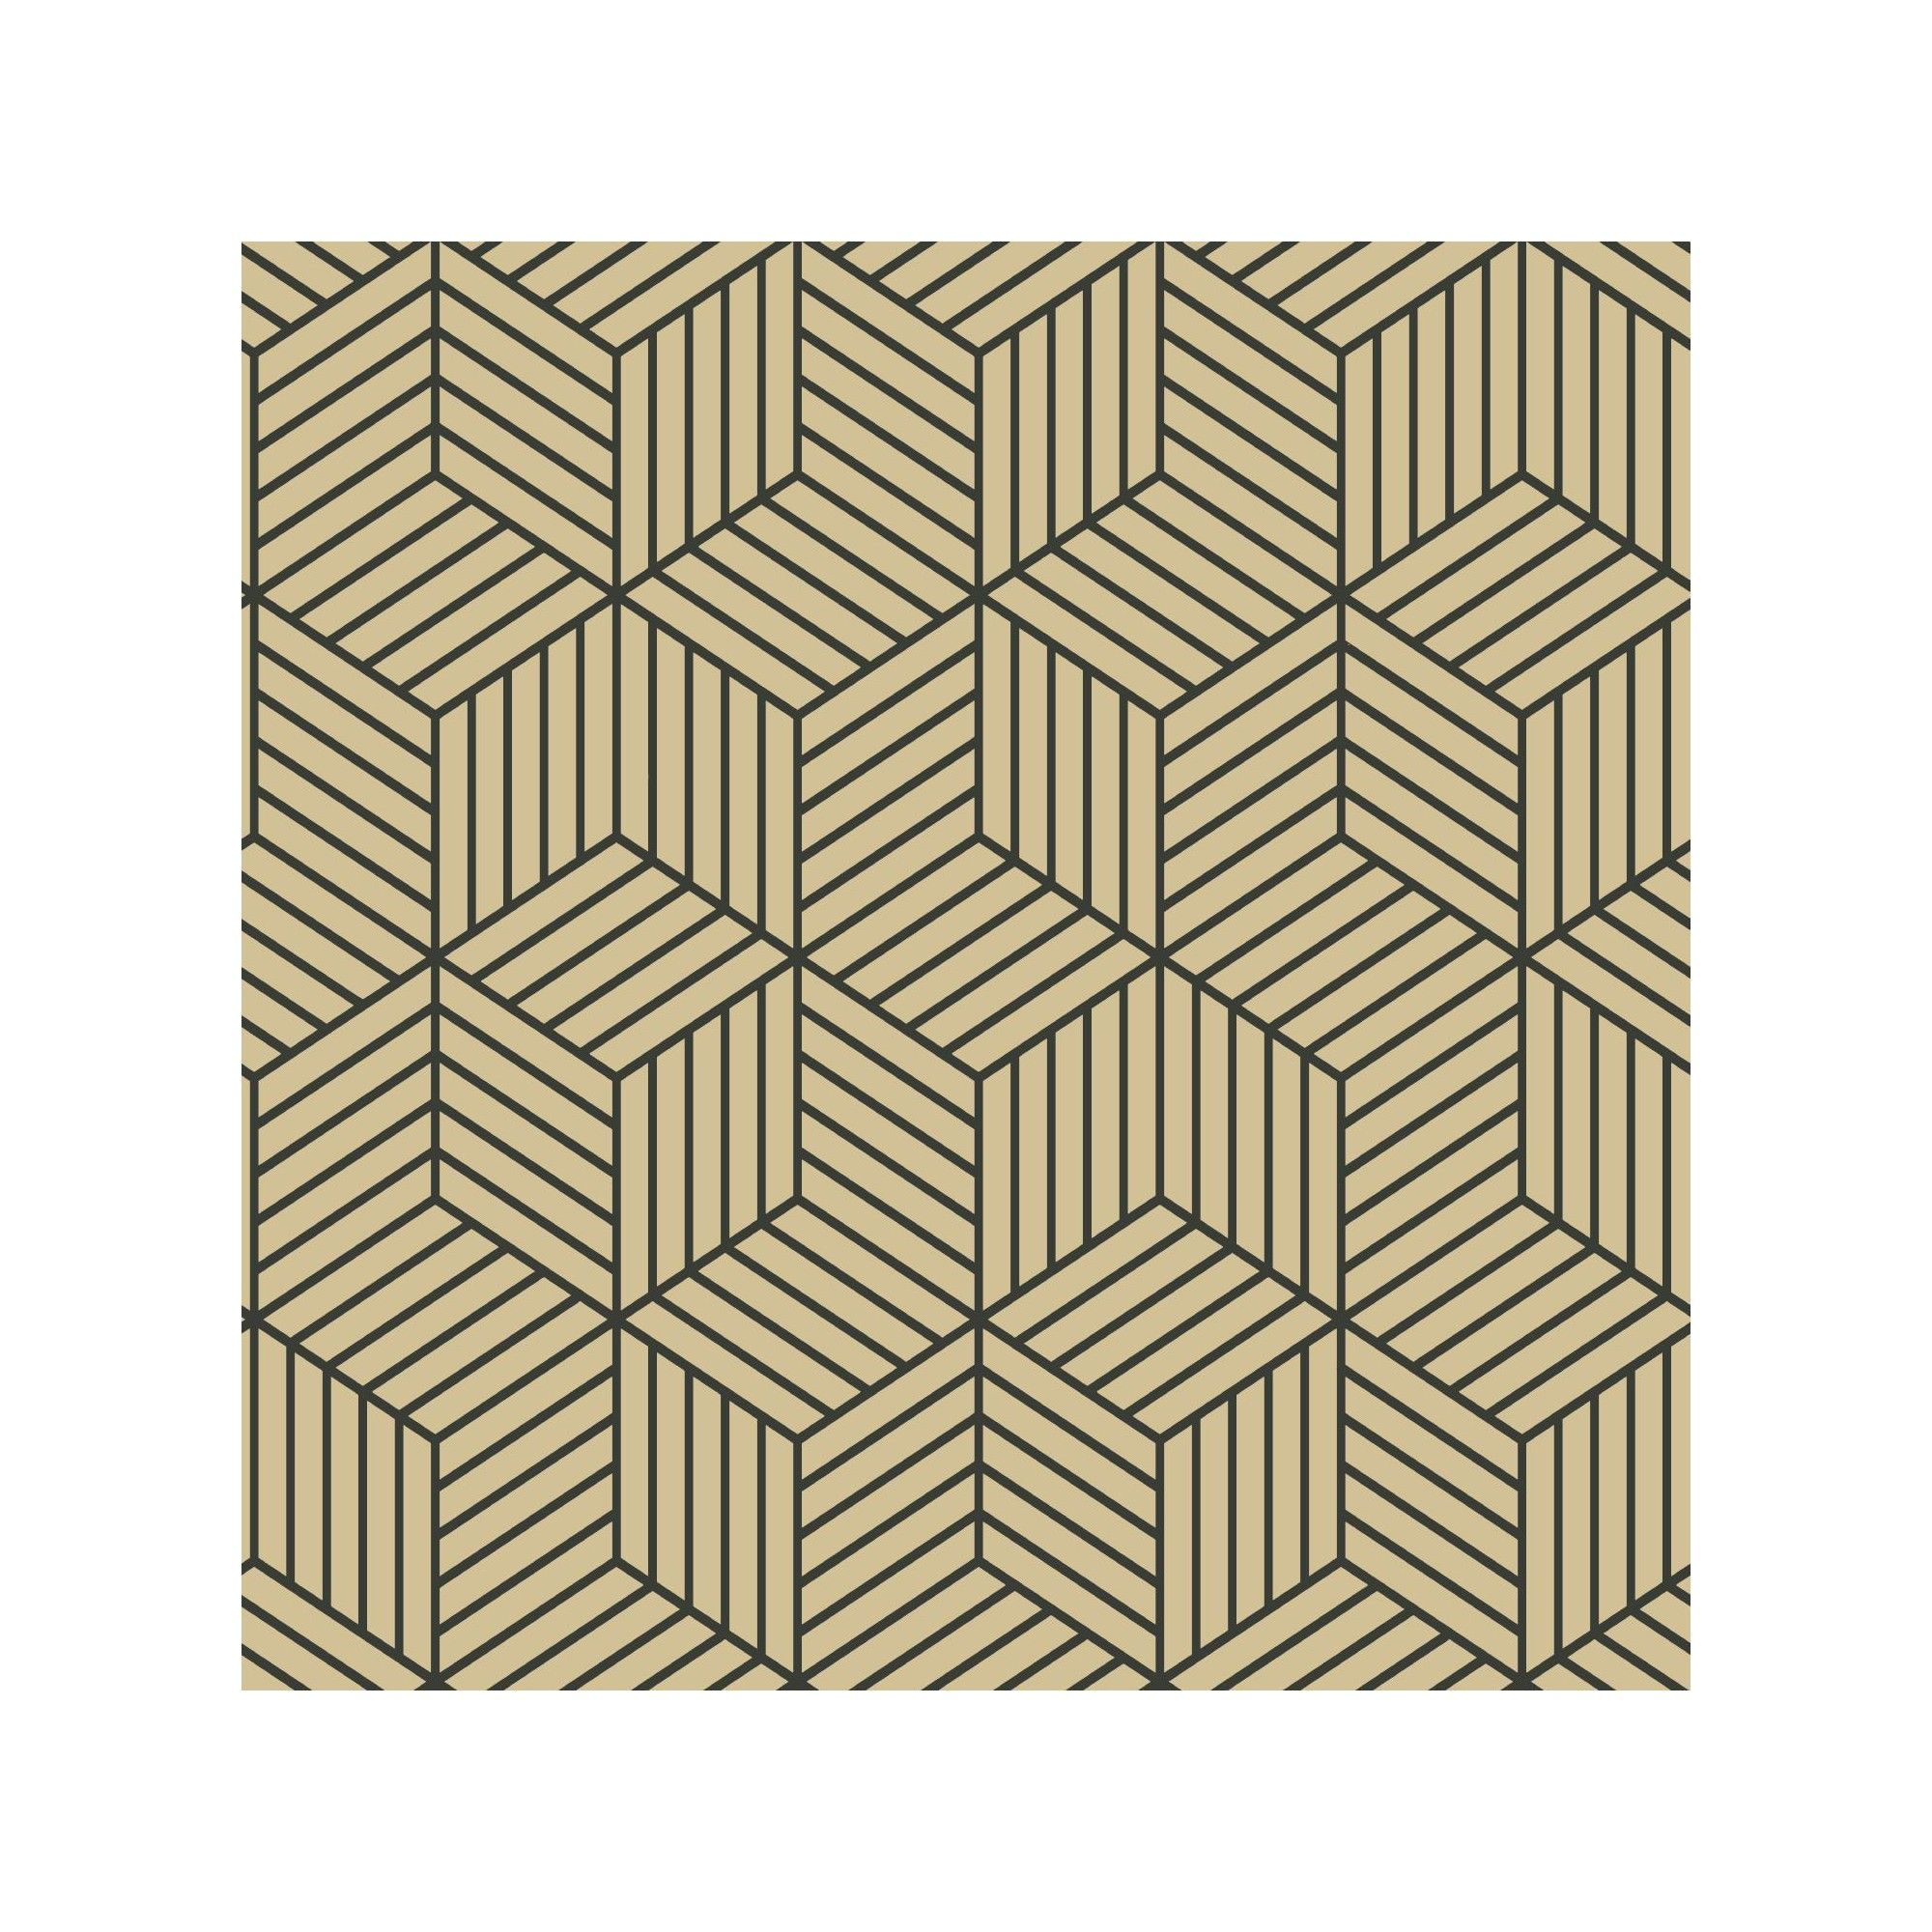 Stripped Hexagon Peel Stick Wallpaper Goldblack Roommates Gold